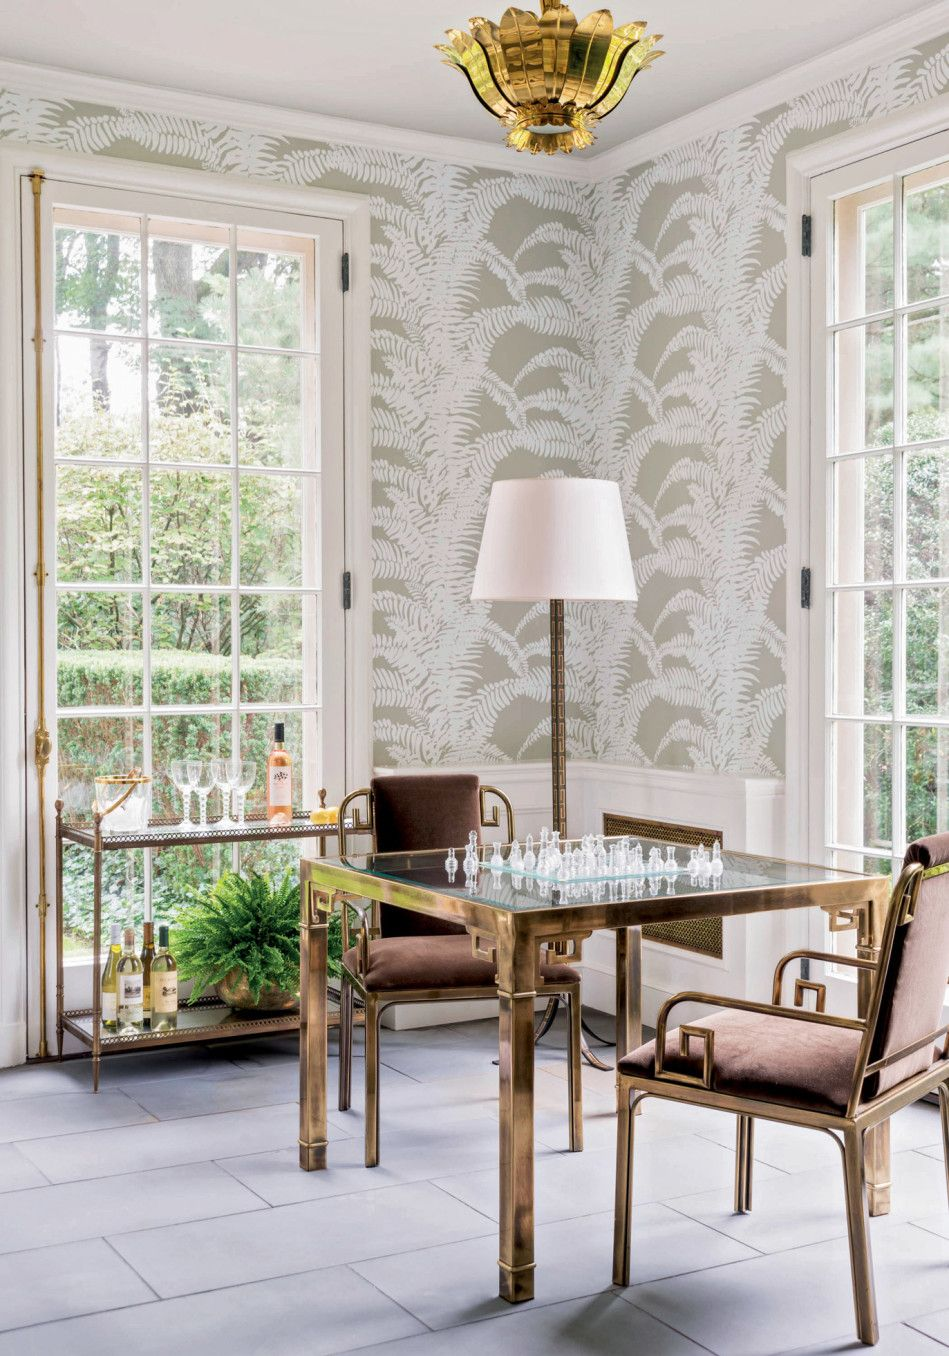 6 decorating secrets from a top interior designer